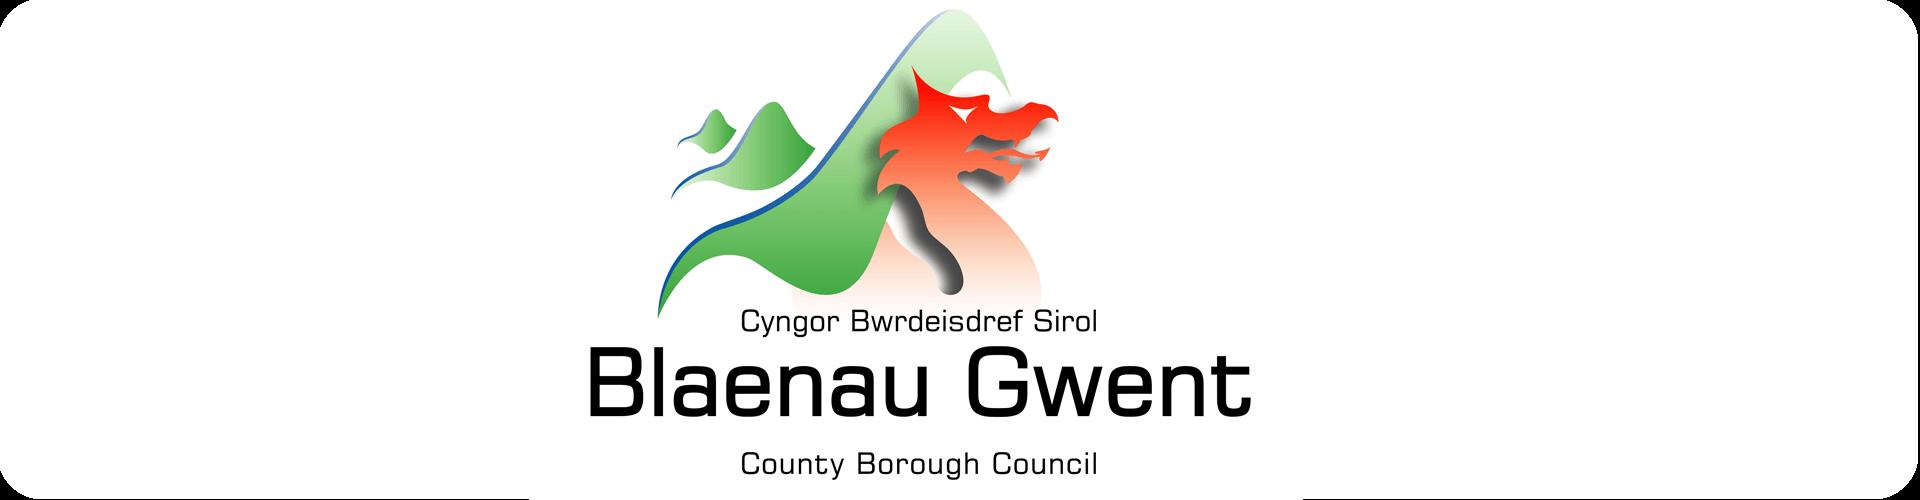 gwent county borough council logo